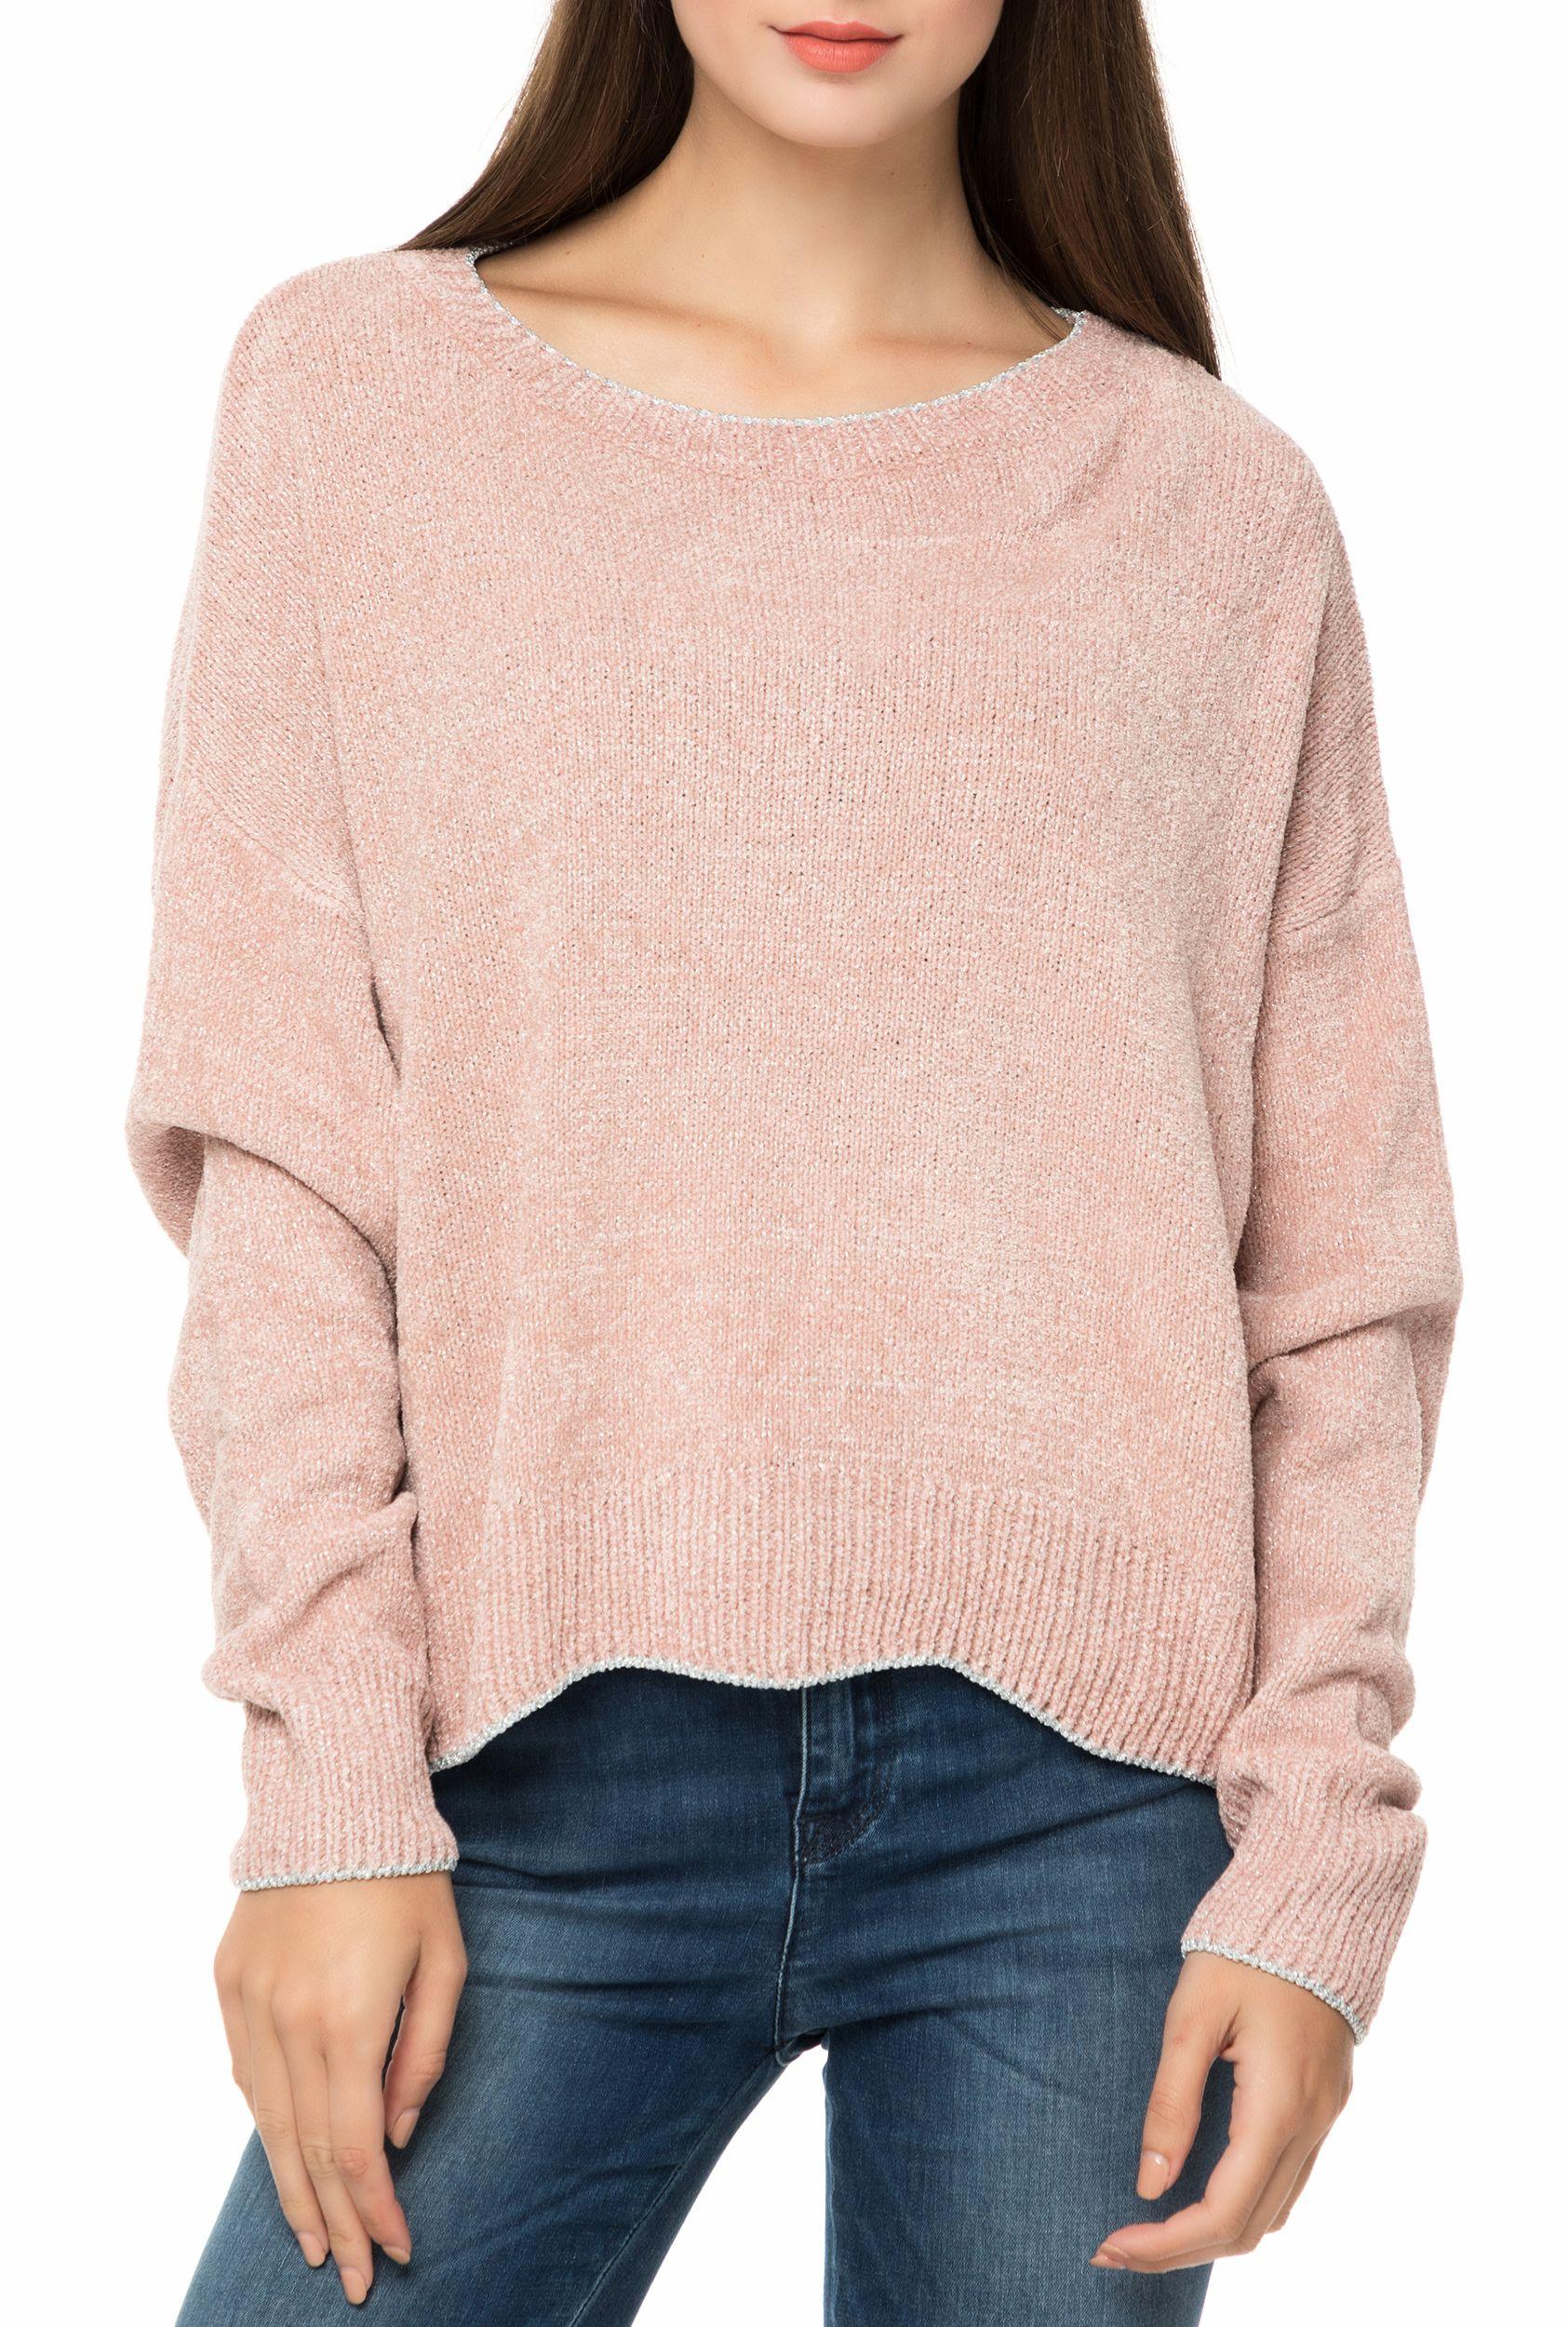 7347125a165 GAS – Γυναικείο πουλόβερ GAS TRICOT LUEL CHENILLE YARN ροζ | DRESS ...